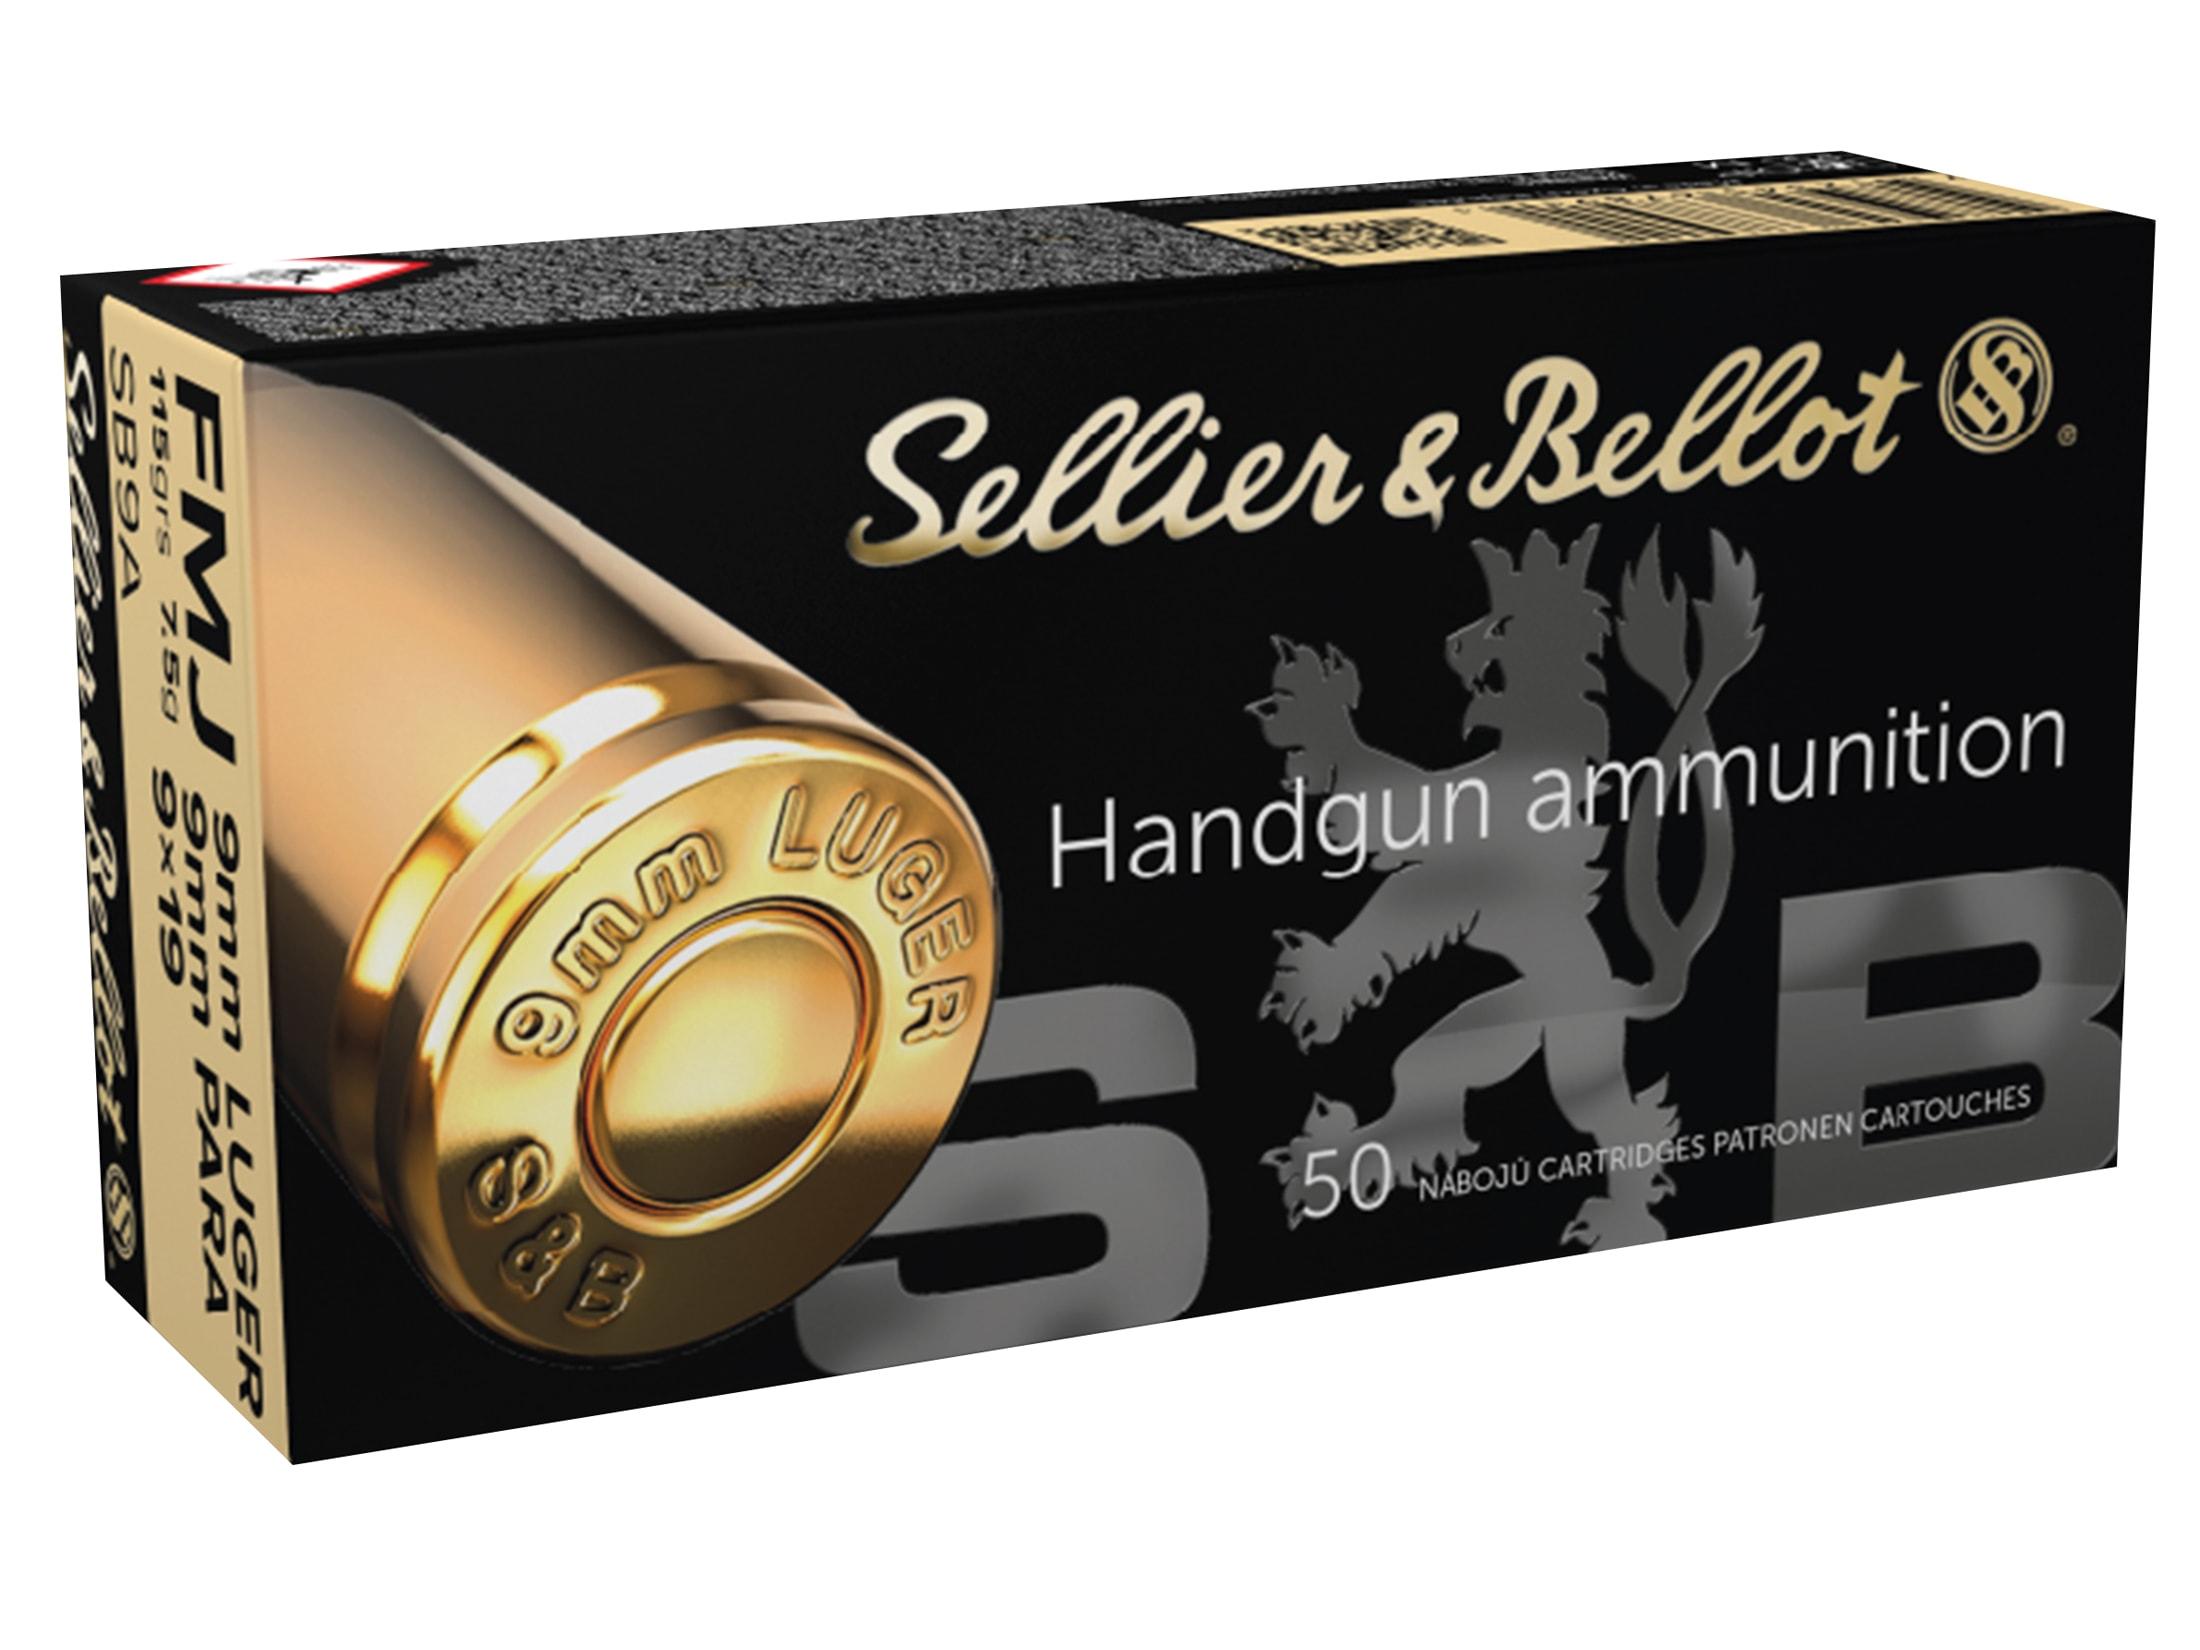 9mm Luger Ammo | 9x19 Parabellum Ammunition | Shop Now and Save